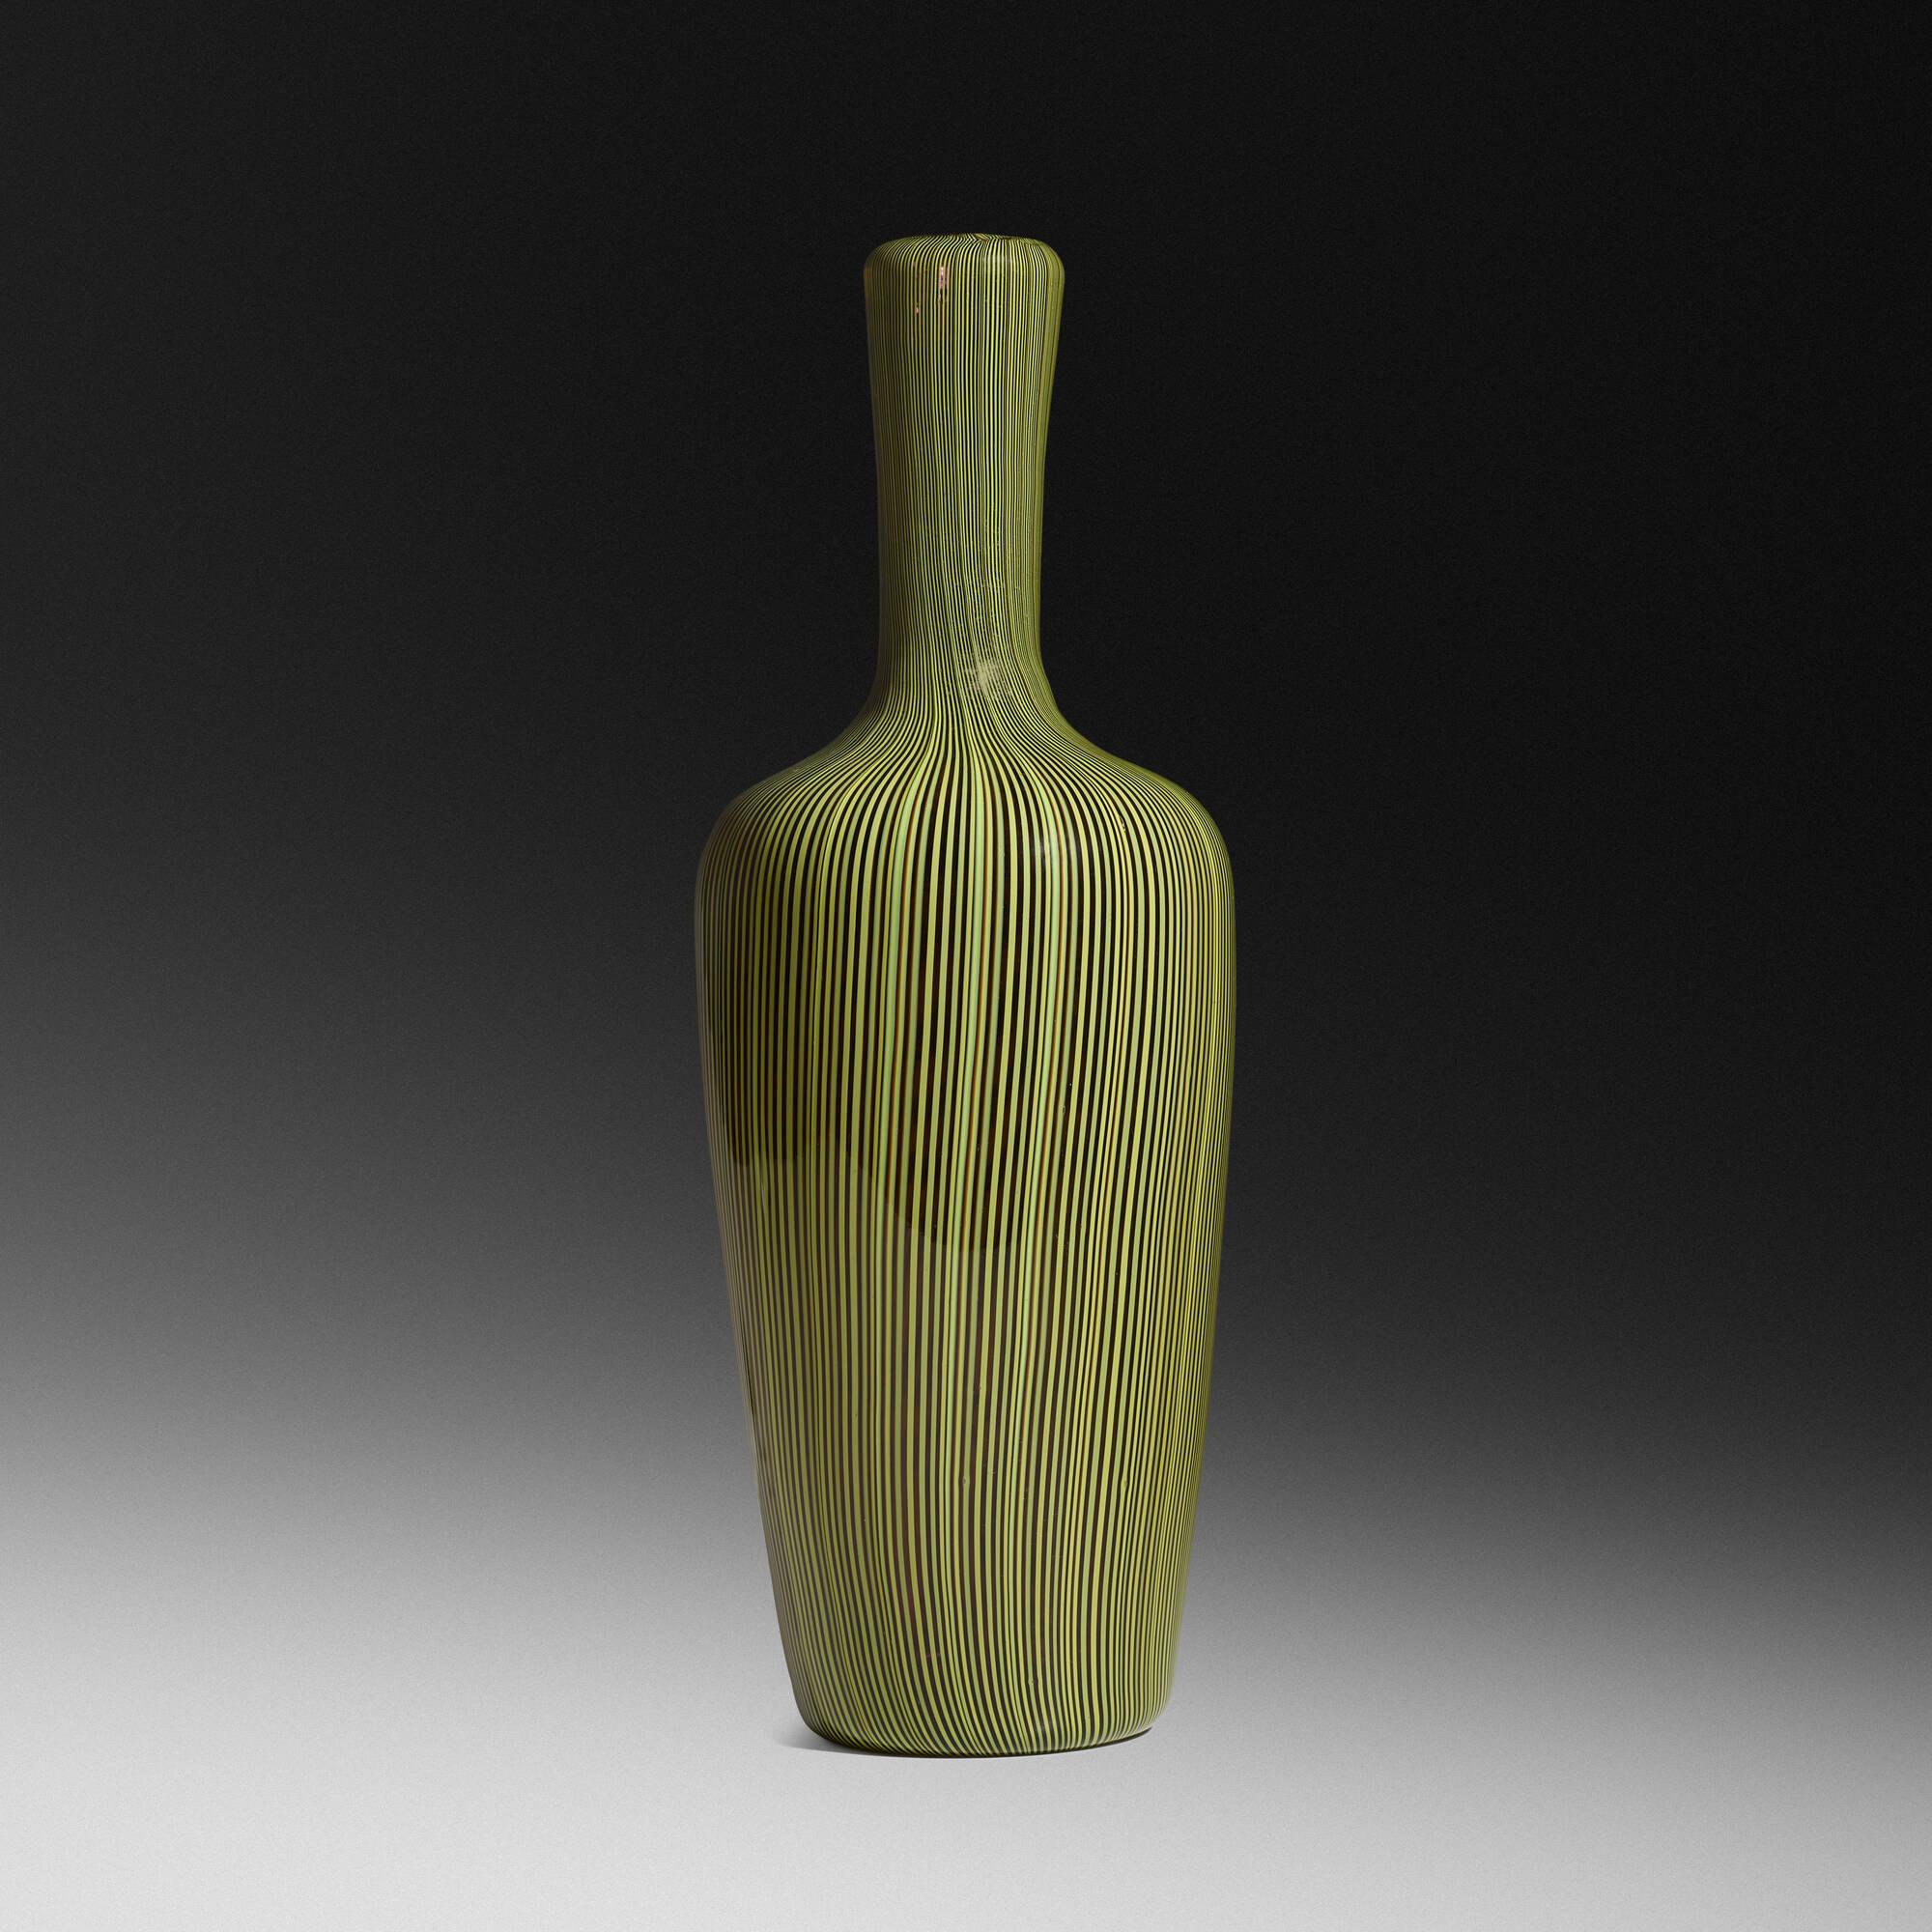 126 carlo scarpa tessuto vase model 3832 important italian 126 carlo scarpa tessuto vase model 3832 1 of 3 floridaeventfo Image collections